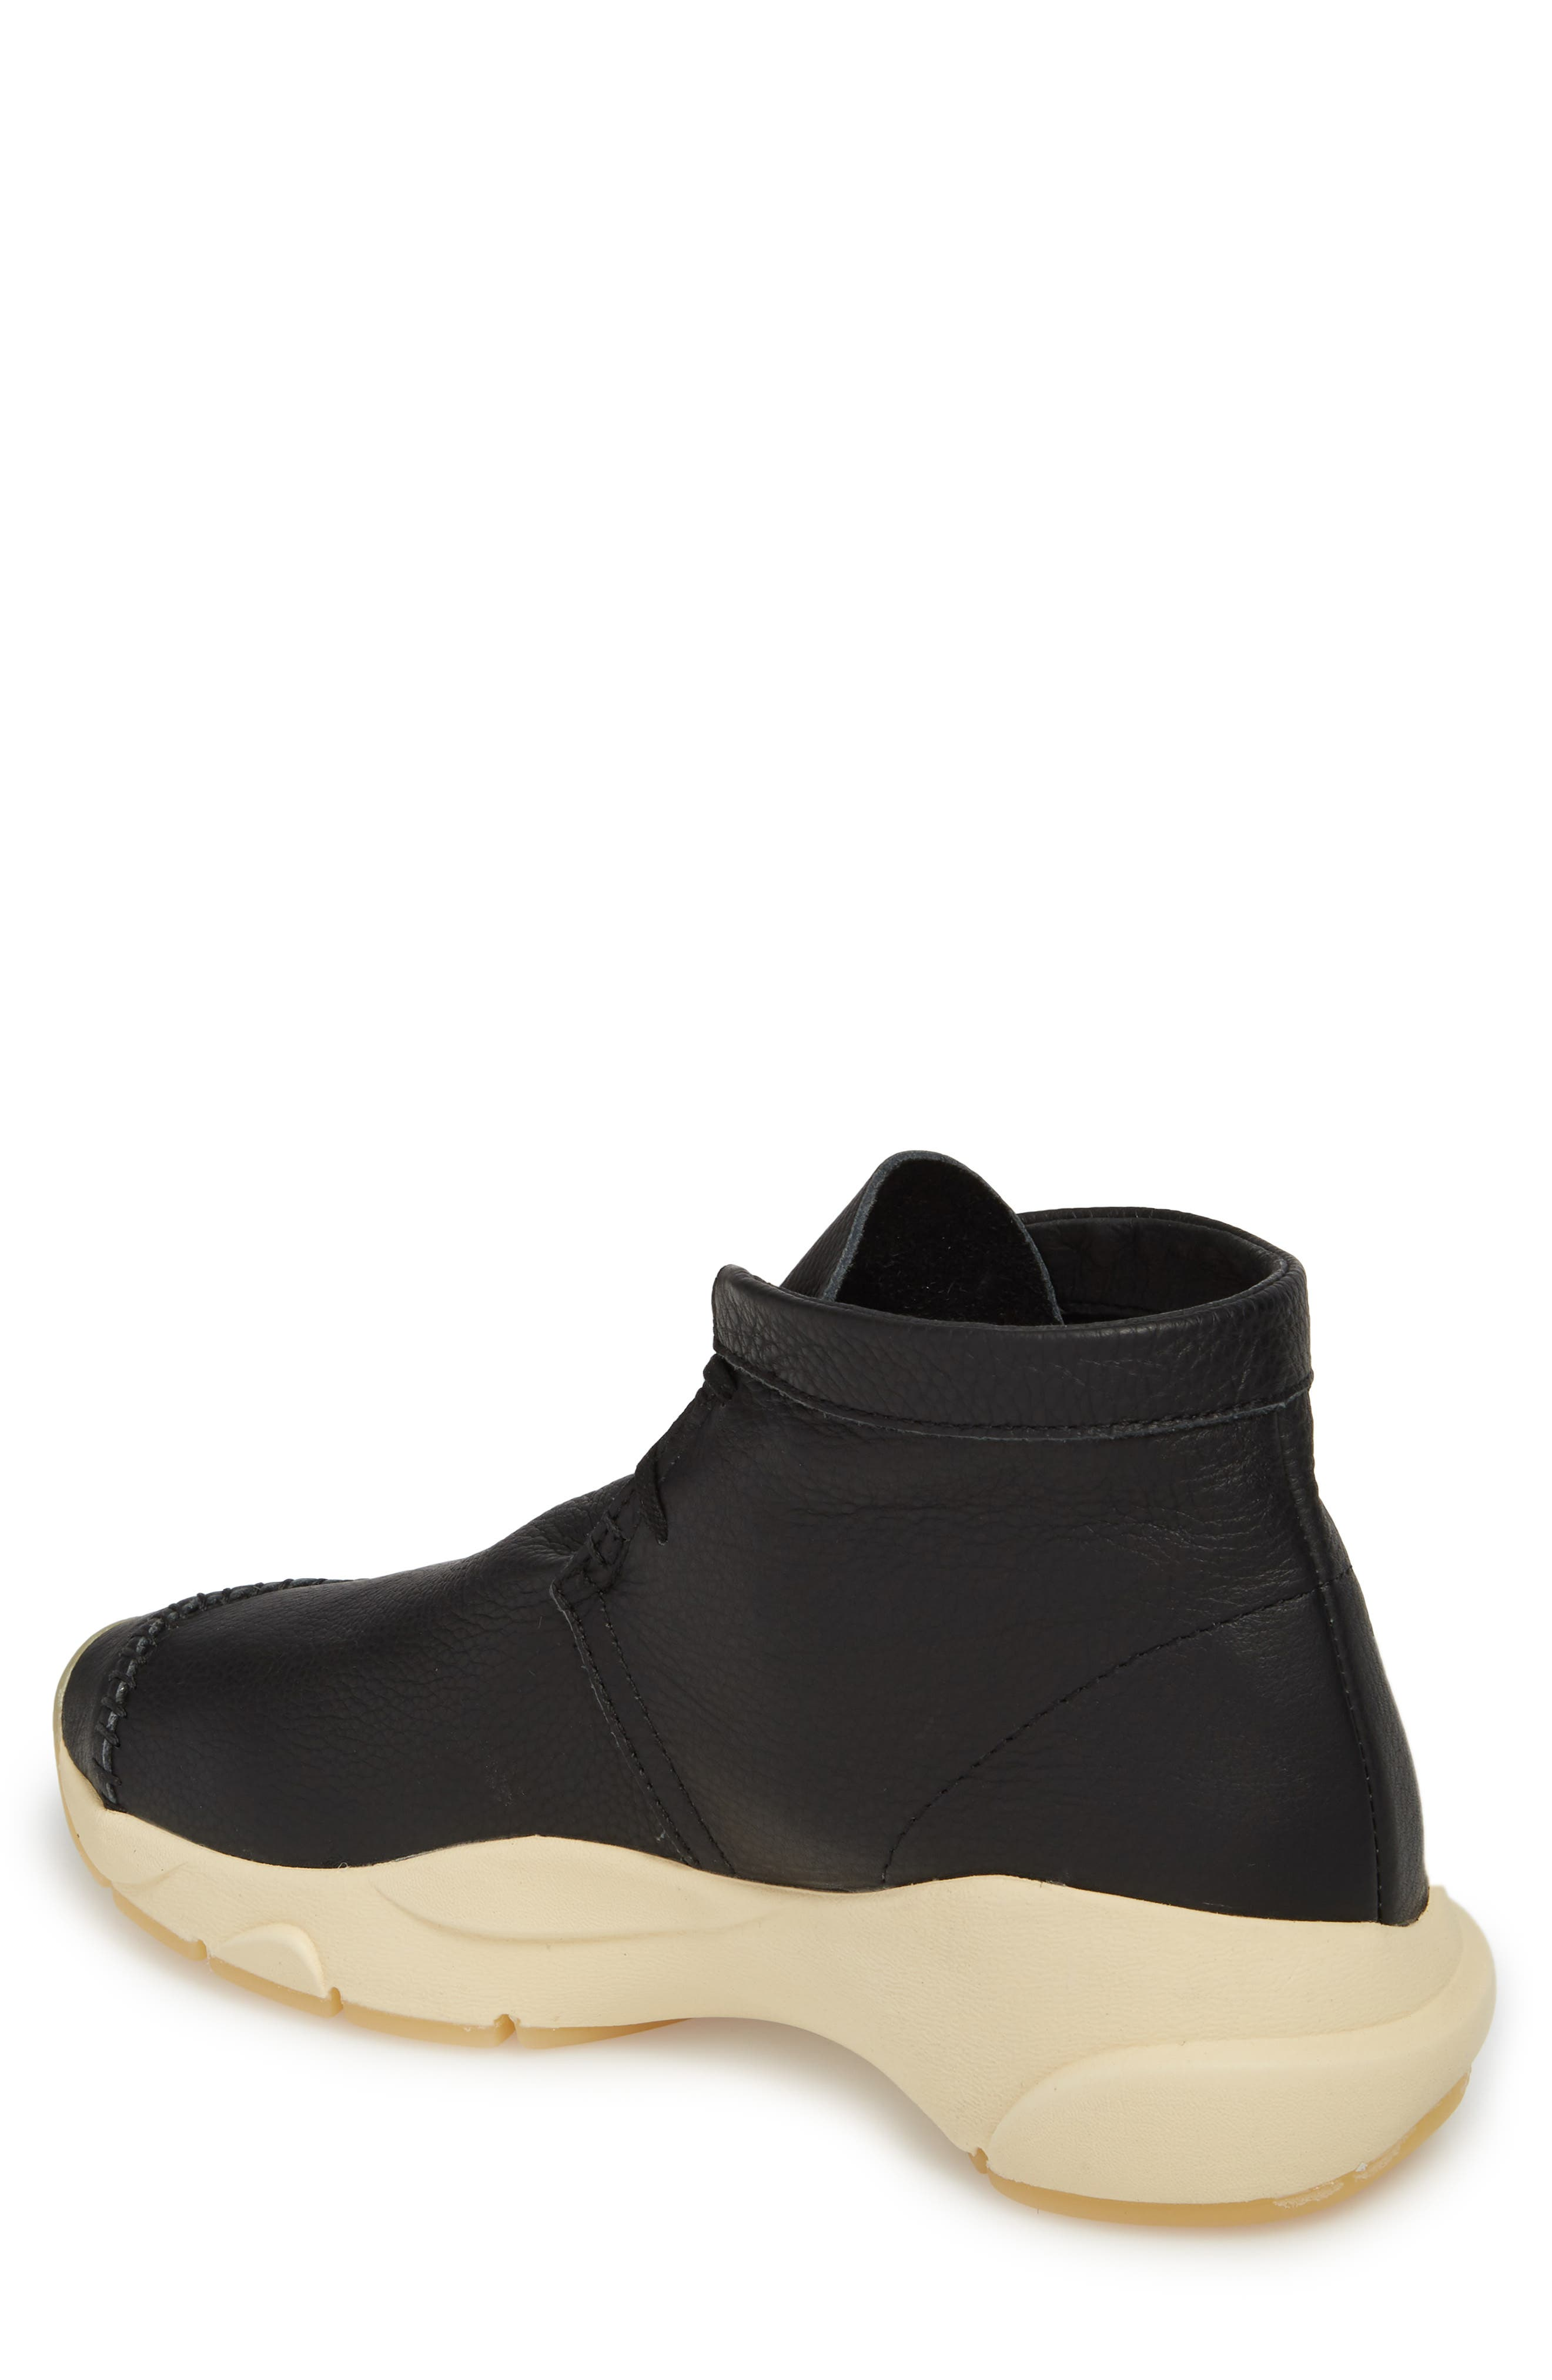 Alternate Image 2  - Clearweather Castas Asymmetrical Chukka Sneaker (Men)